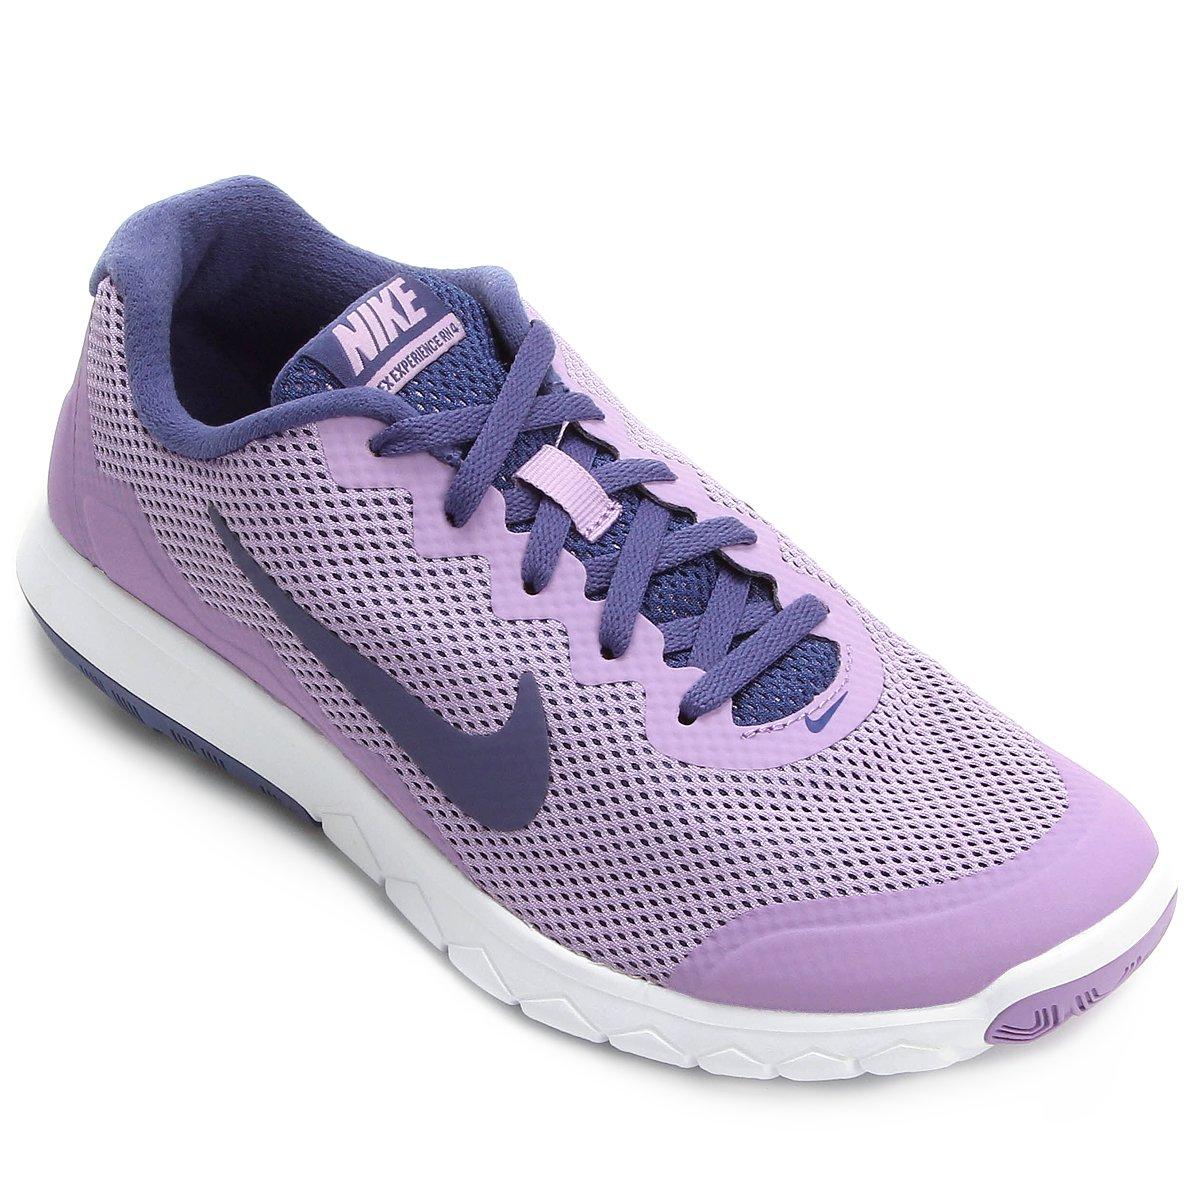 Tênis Nike Flex Experience Rn 4 Feminino Lilás E Azul